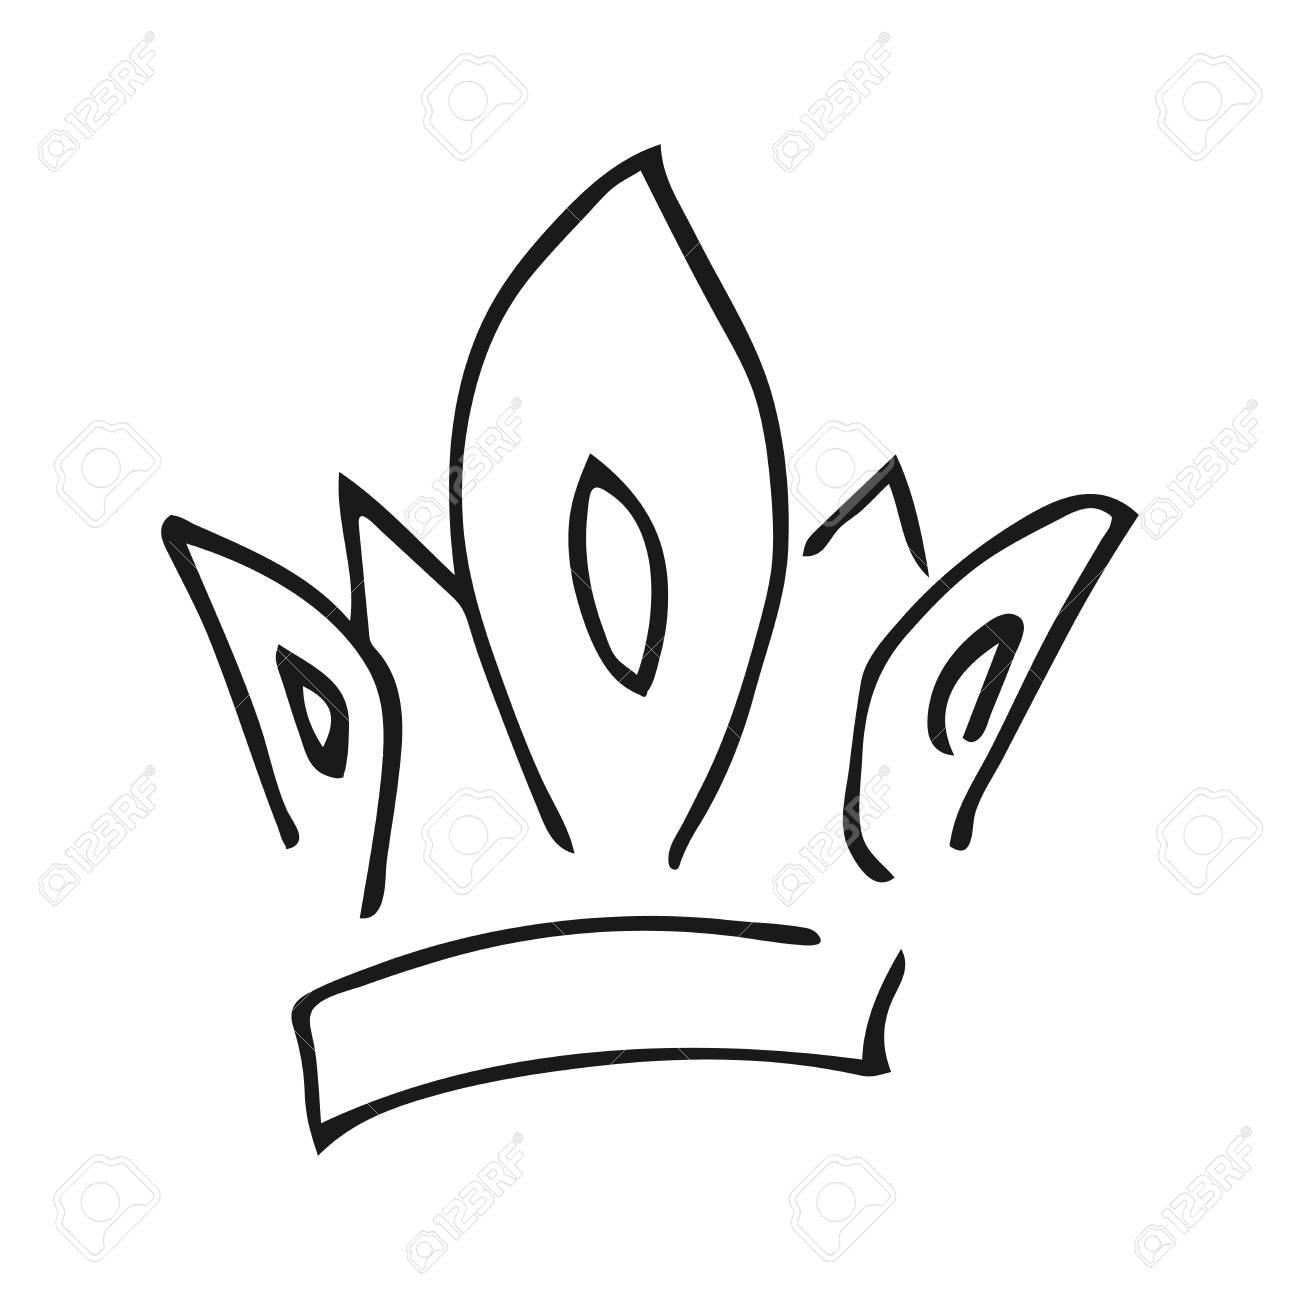 Hand drawn crown  Simple graffiti sketch queen or king crown